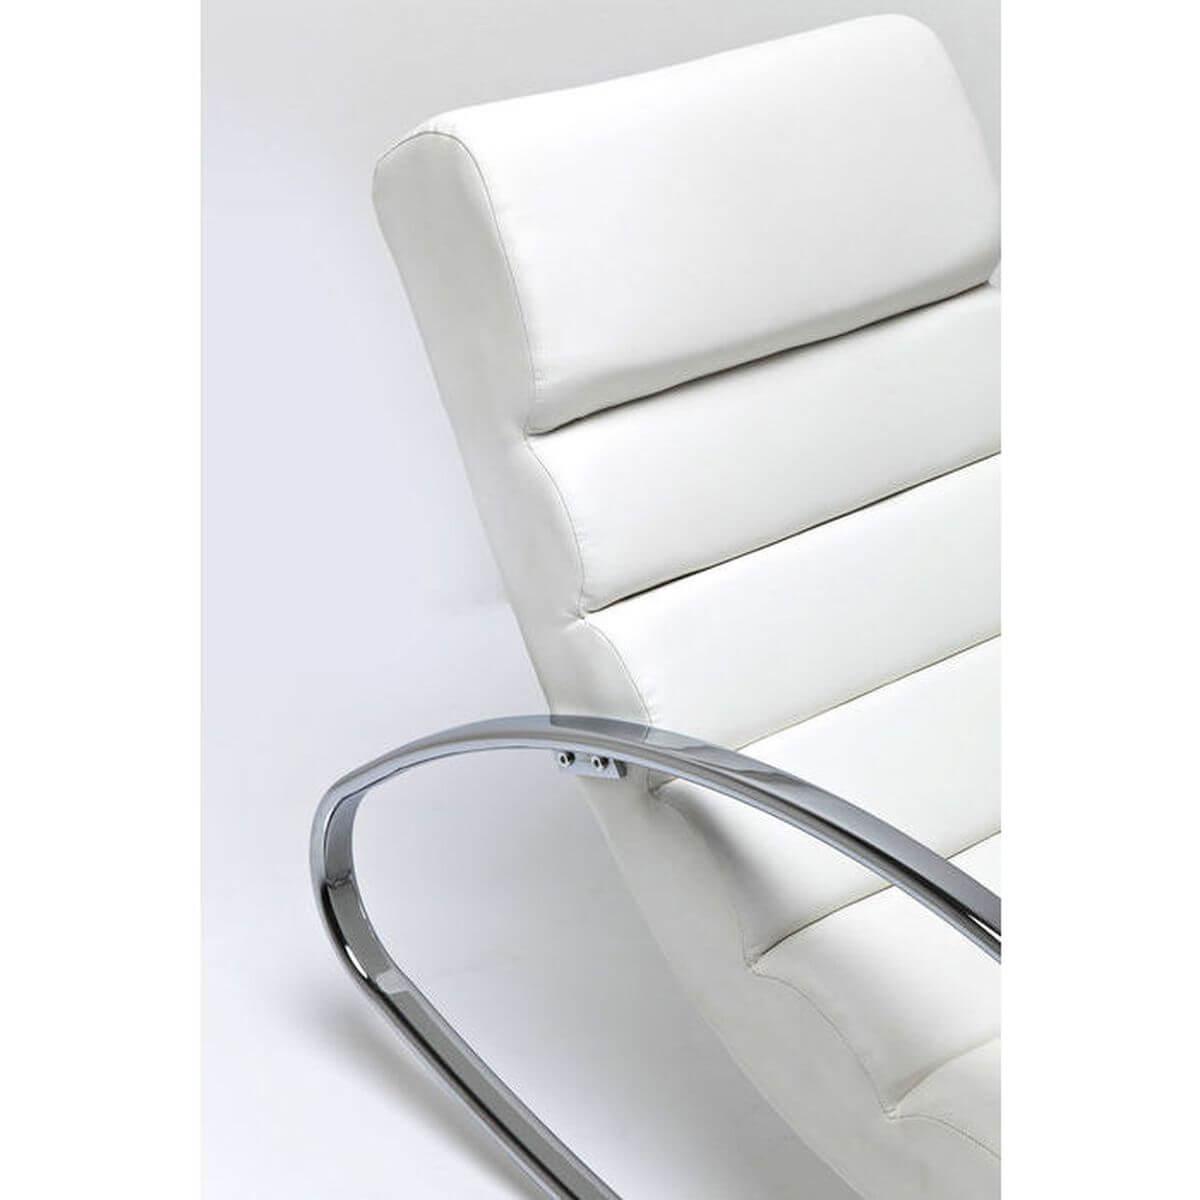 Fauteuil à bascule MANHATTAN Kare Design